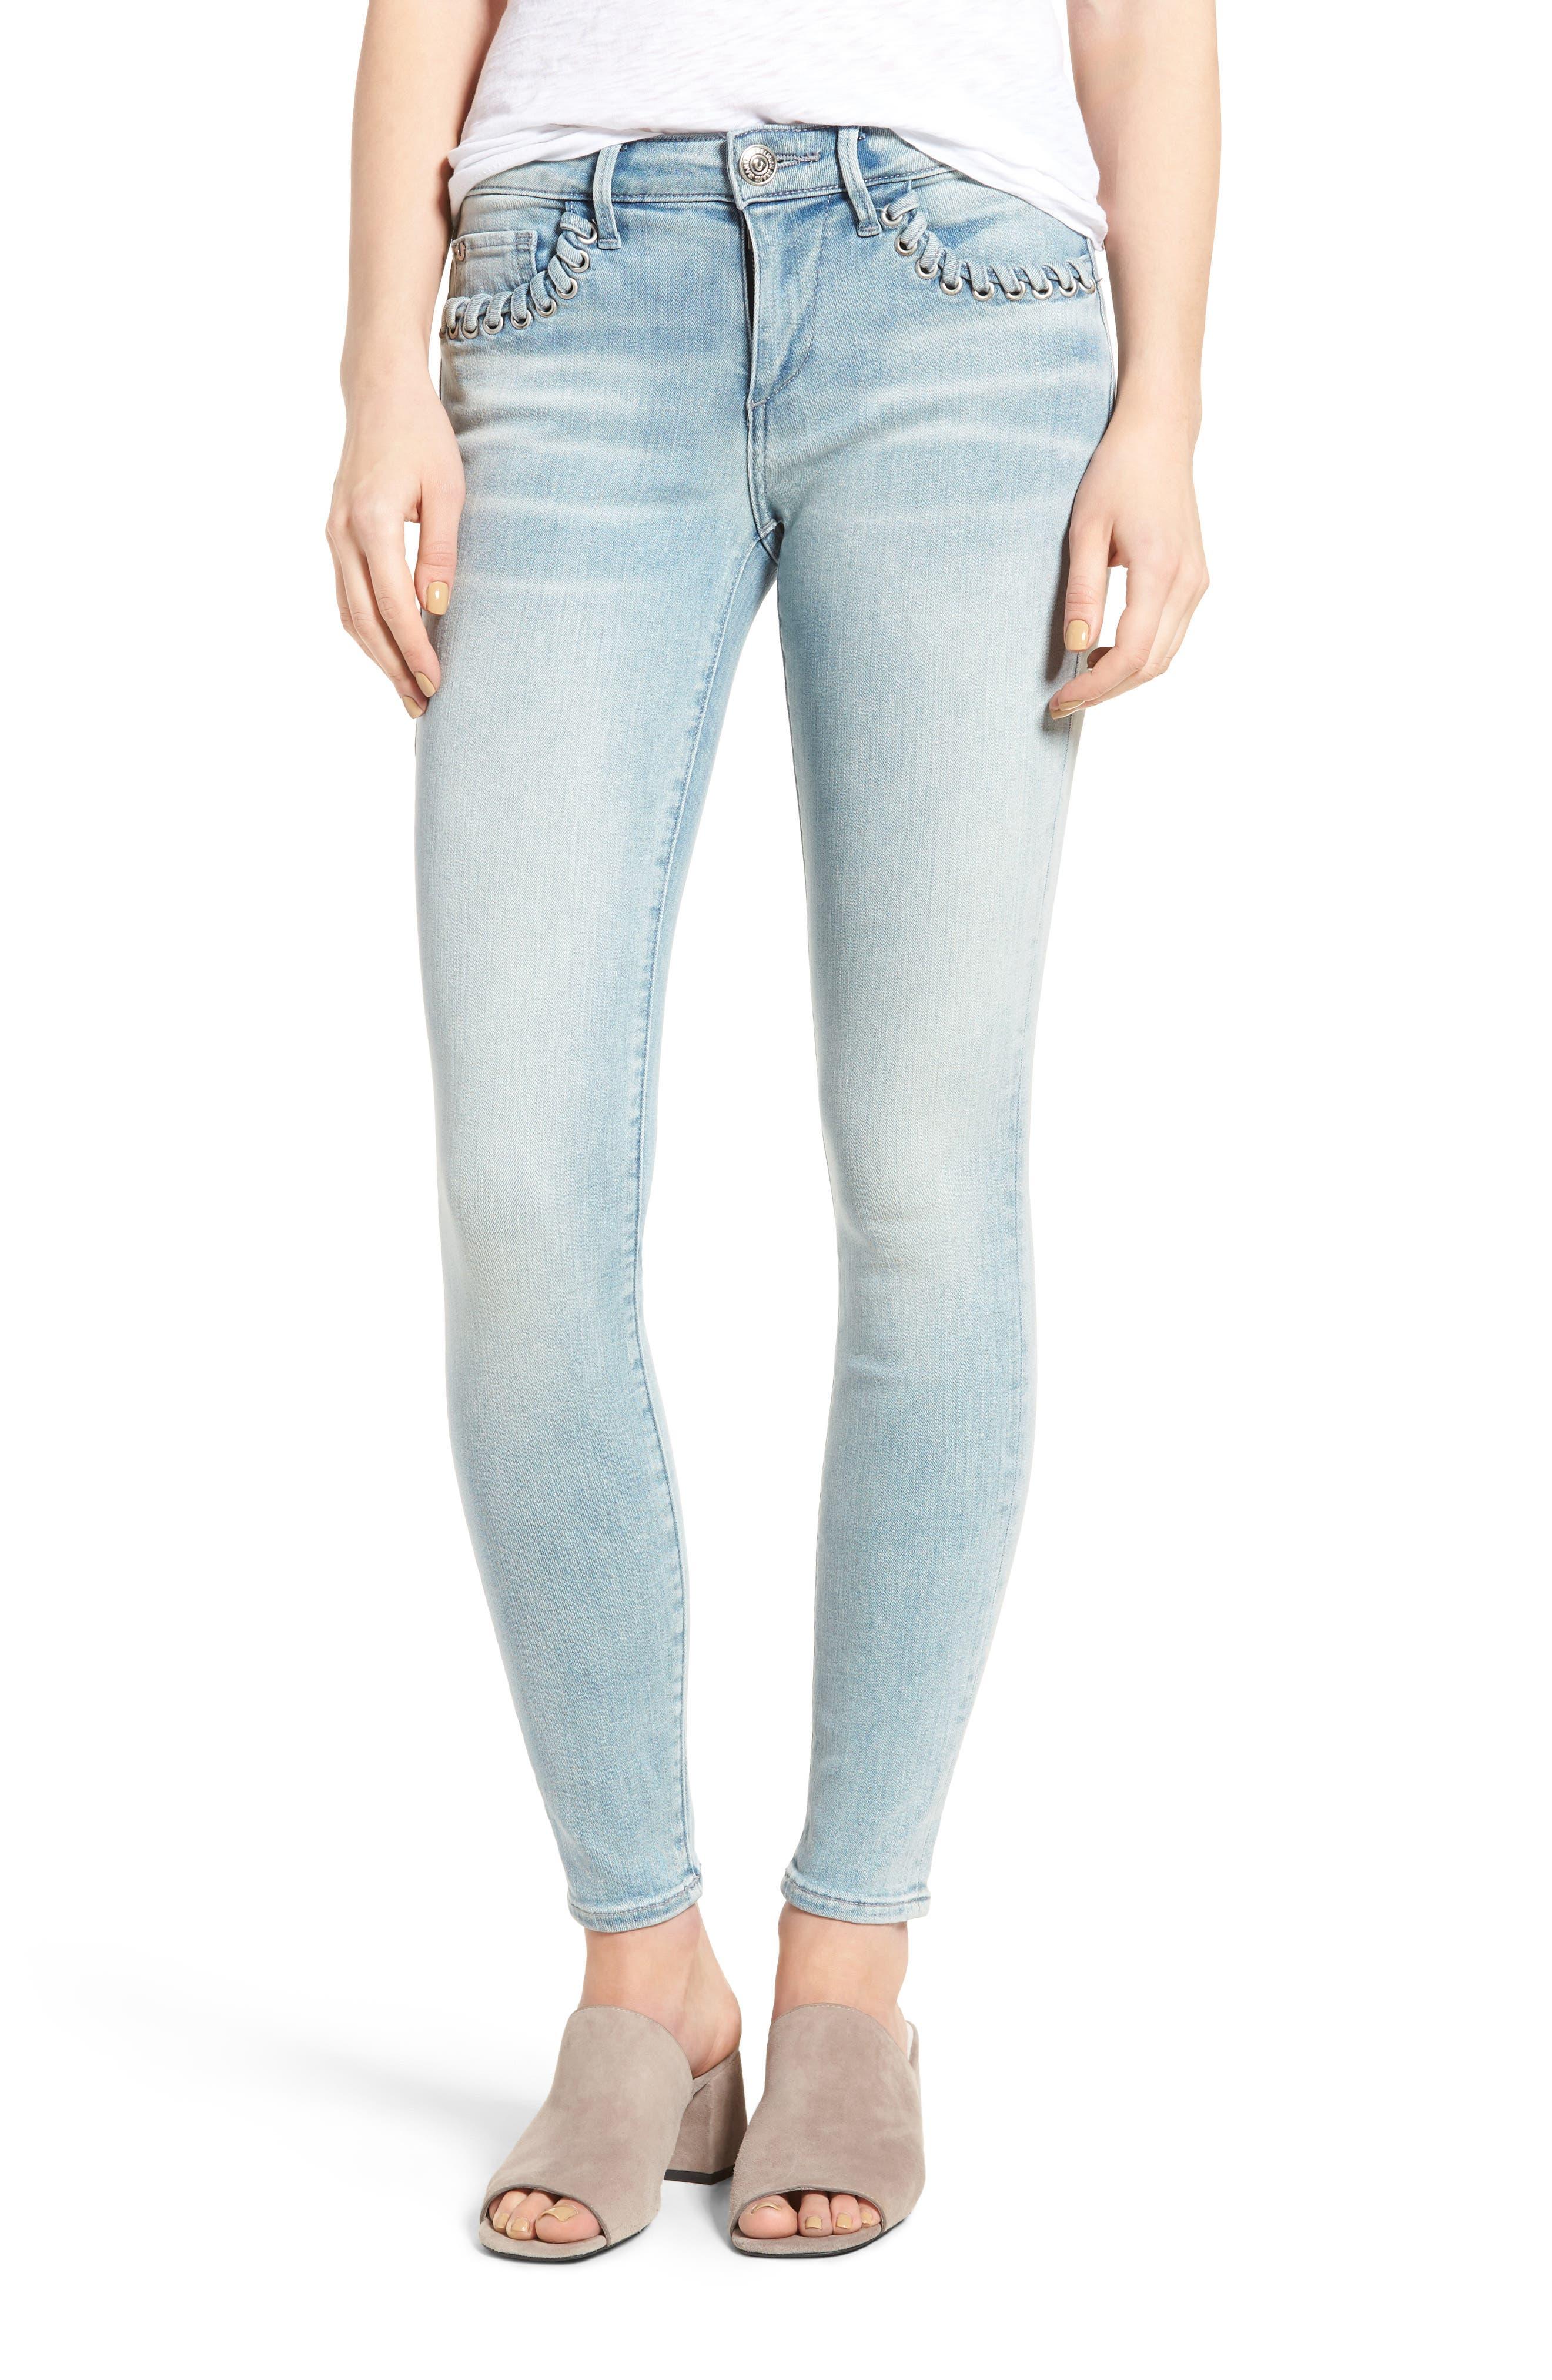 Alternate Image 1 Selected - True Religion Brand Jeans Halle Super Skinny Jeans (Cloud Nine)